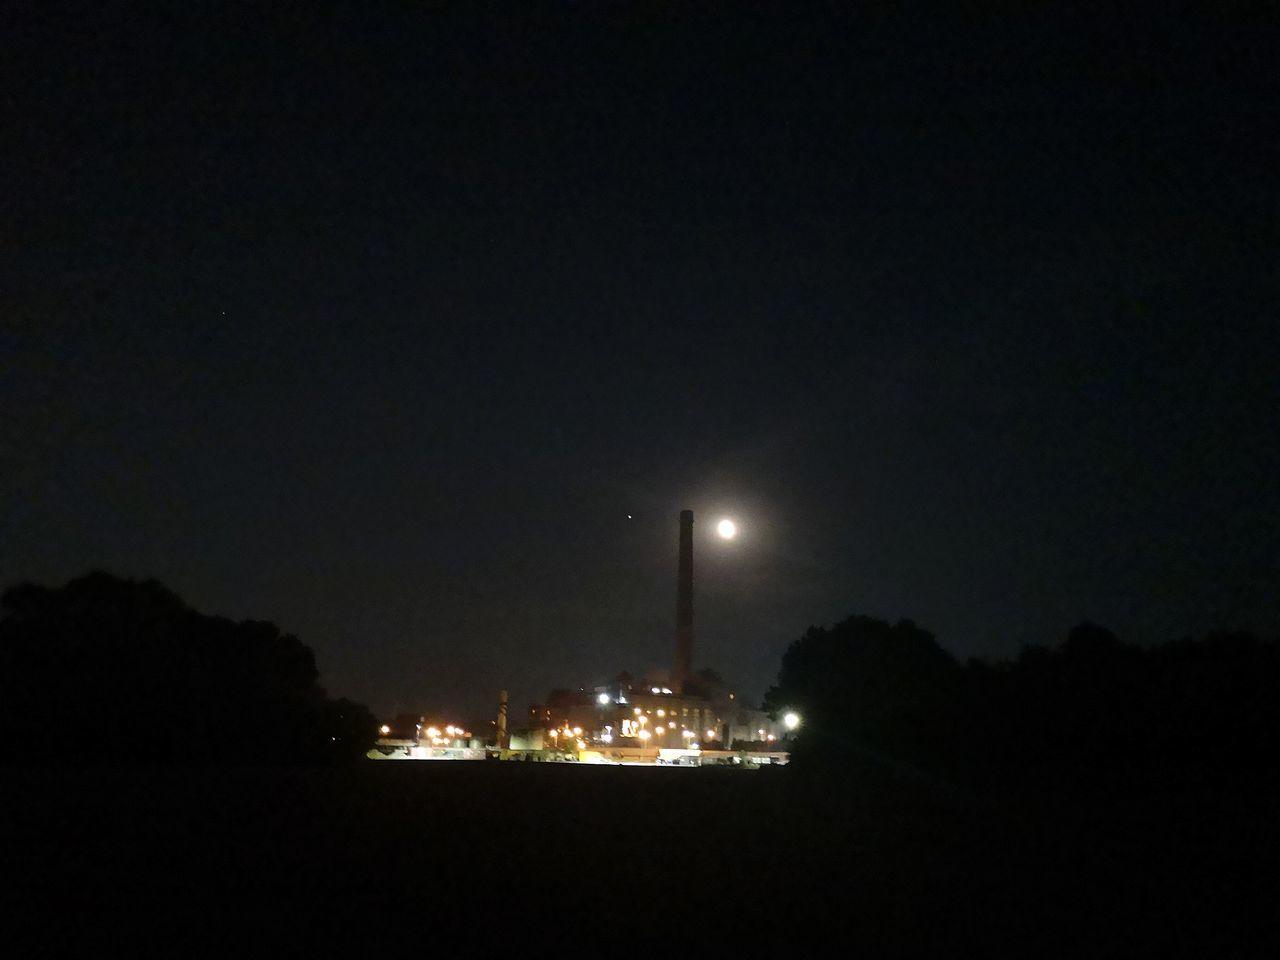 ILLUMINATED STREET LIGHTS AGAINST CLEAR SKY AT NIGHT